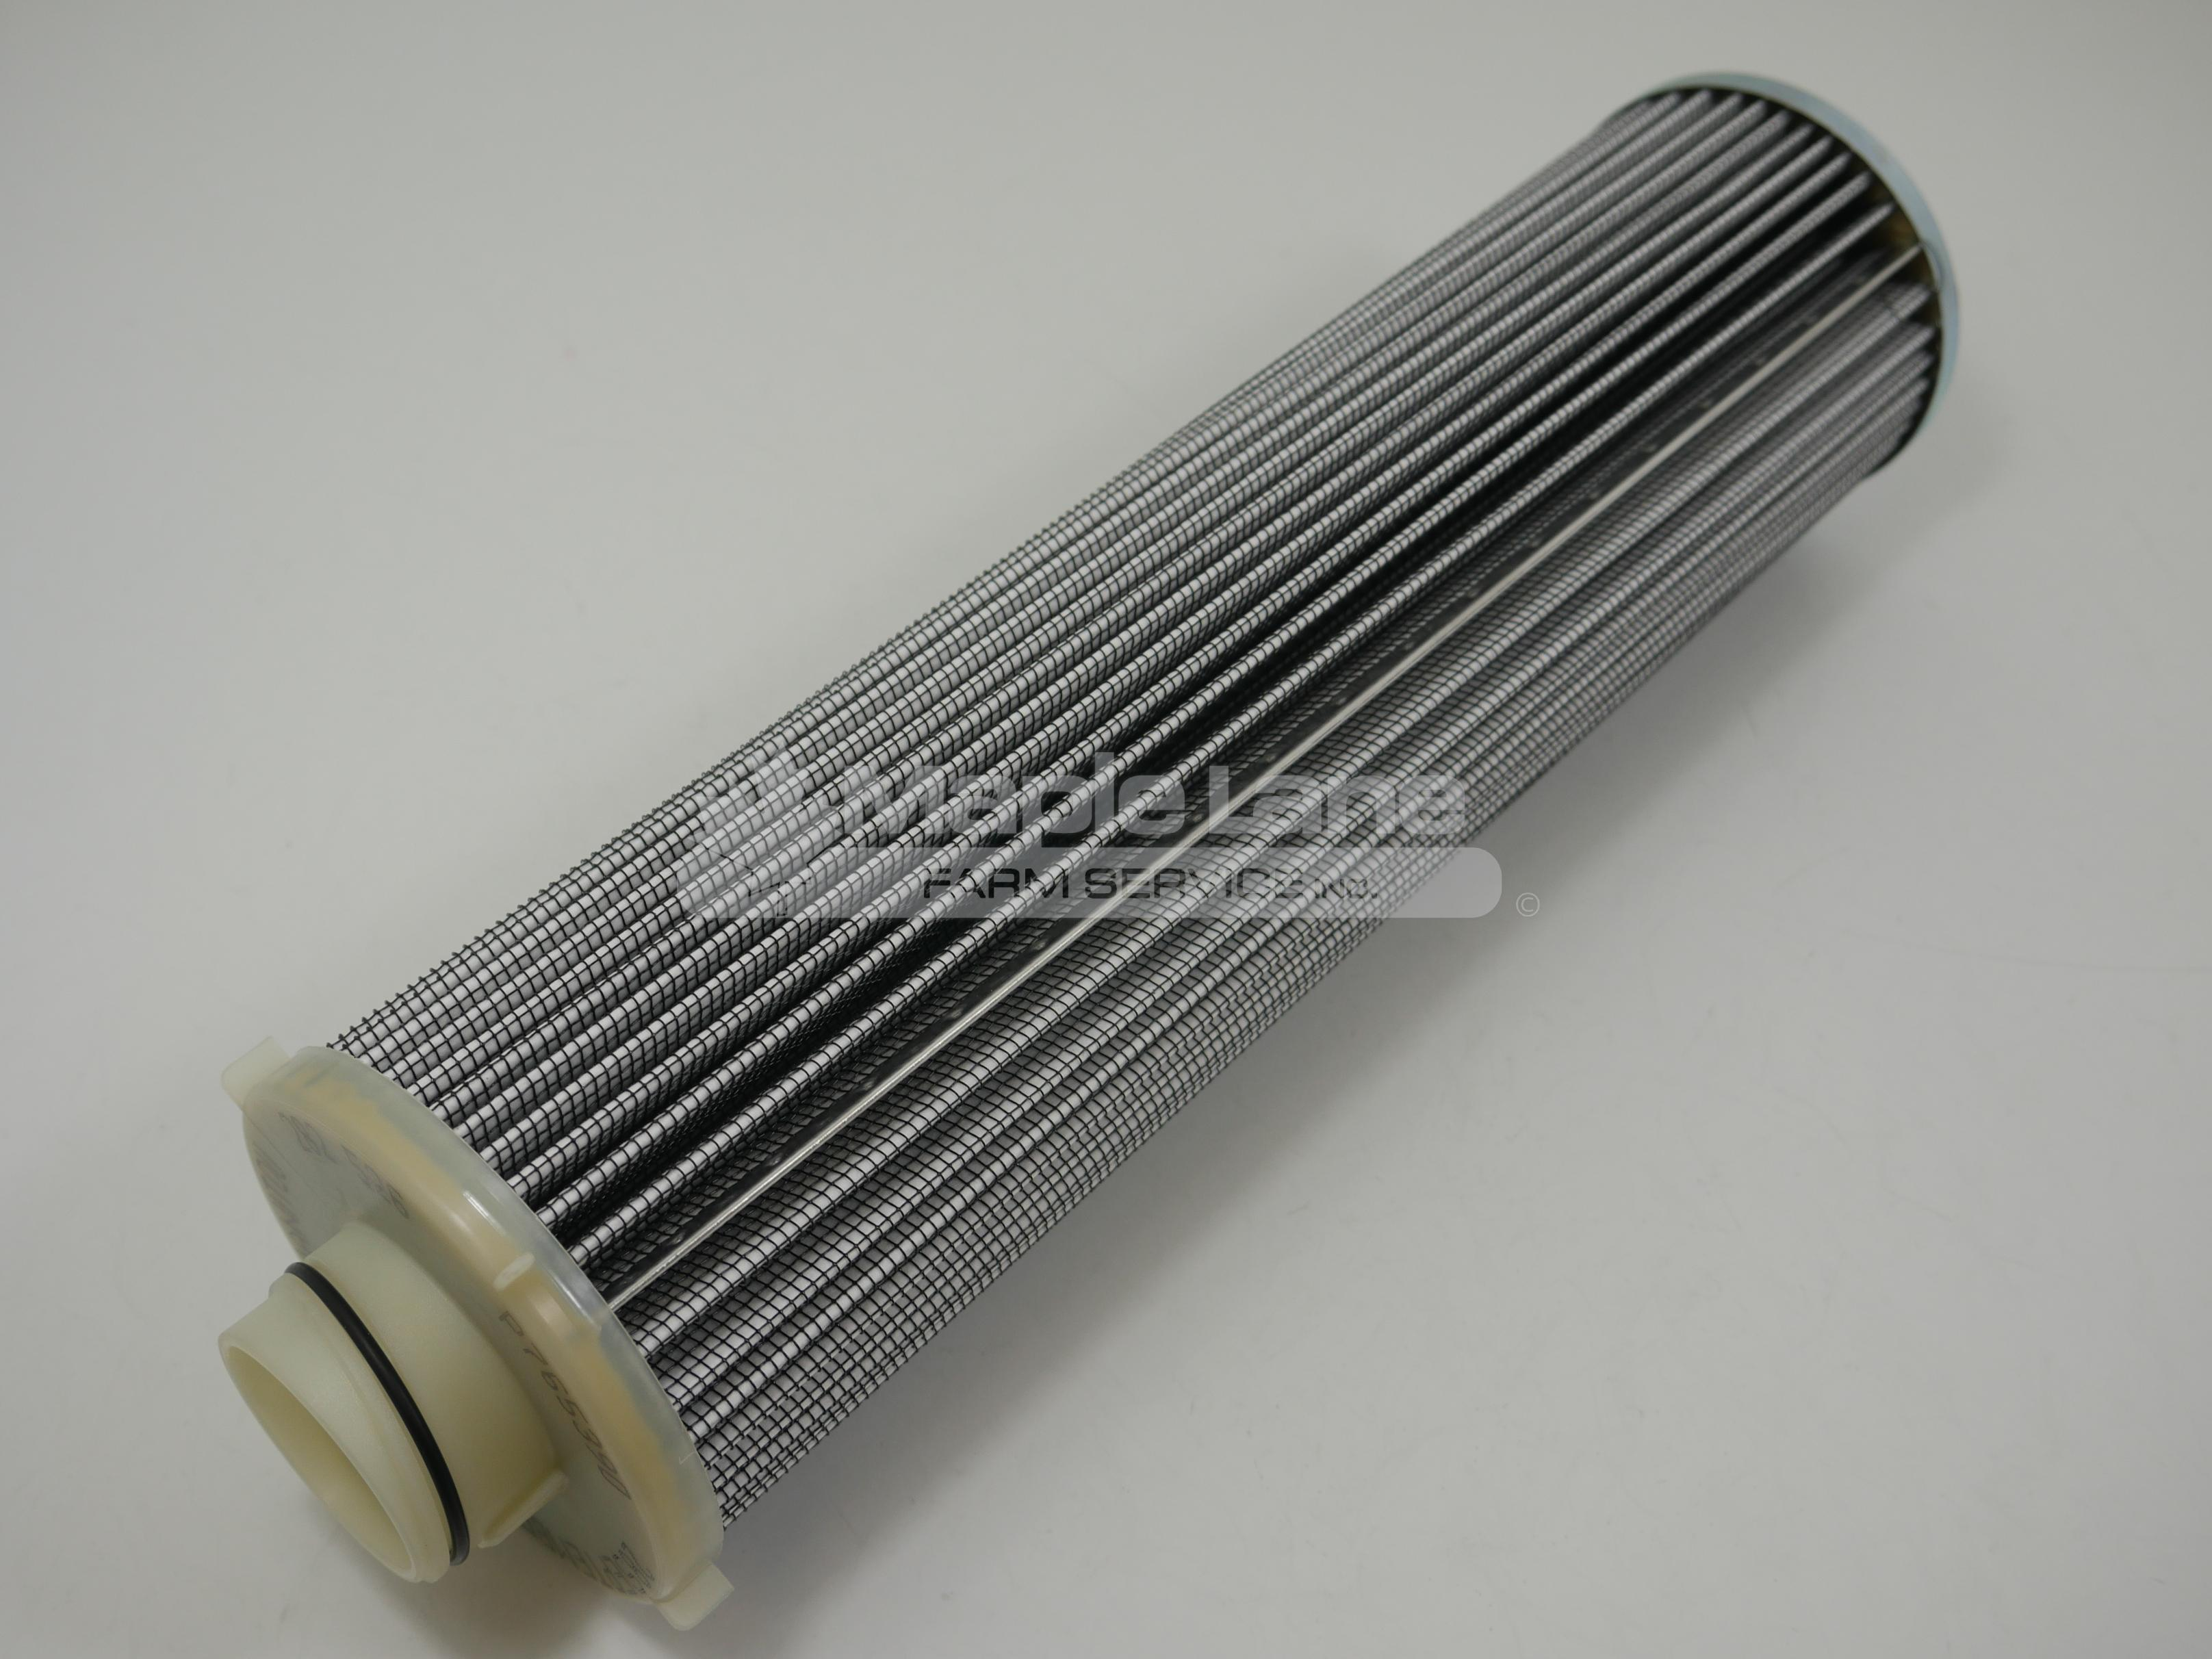 J282526 Hydraulic Filter